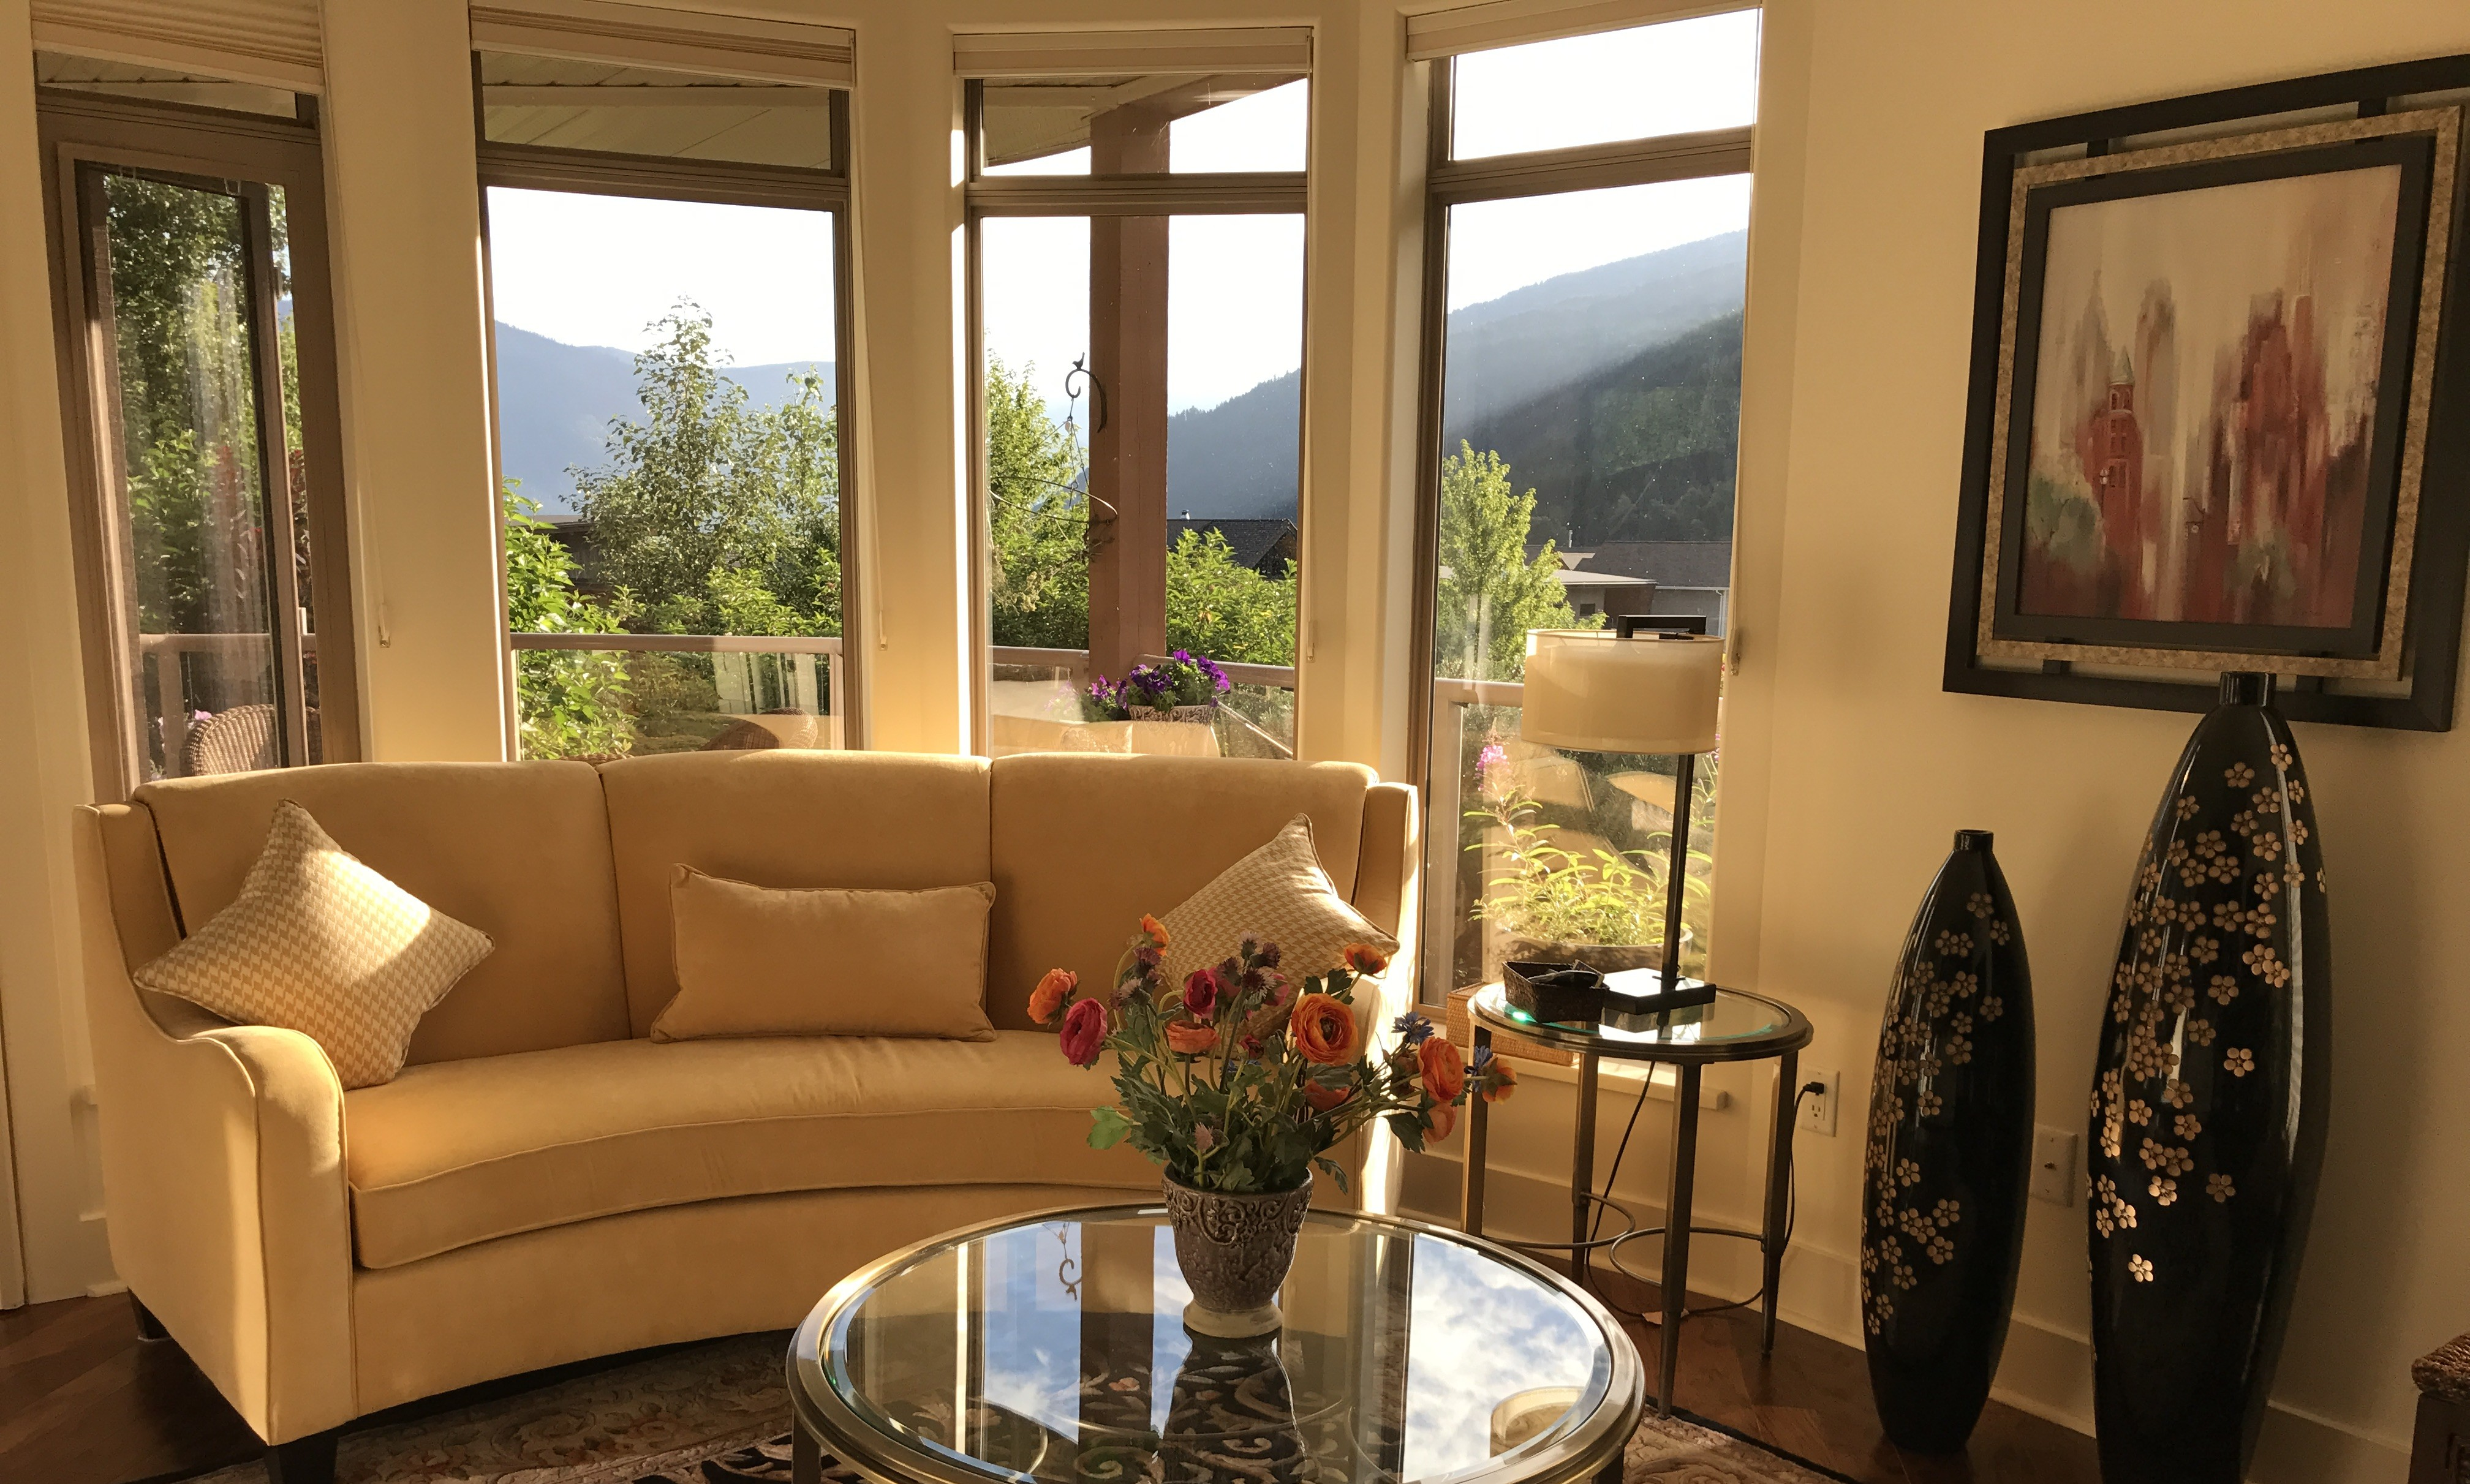 Kootenai Moon Furniture SofaSectionalChaiseChair Chaise Loungeleather